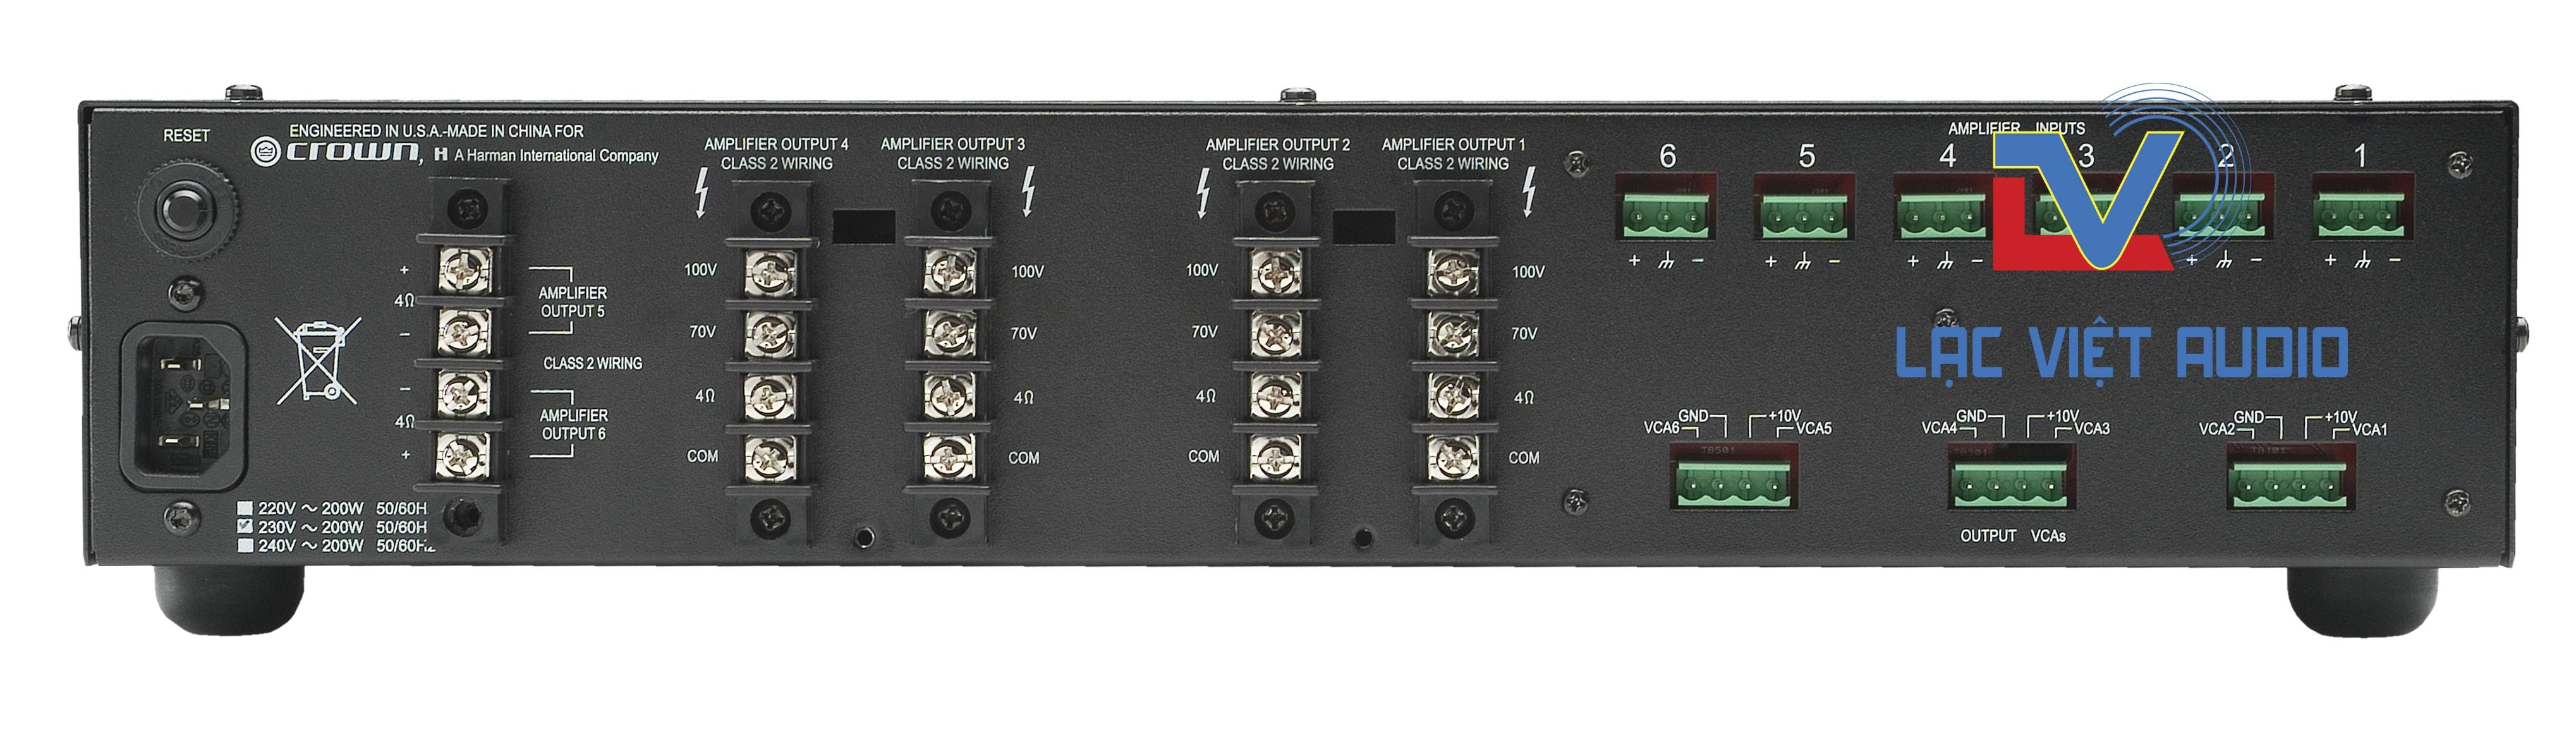 Ampli Crow 660A